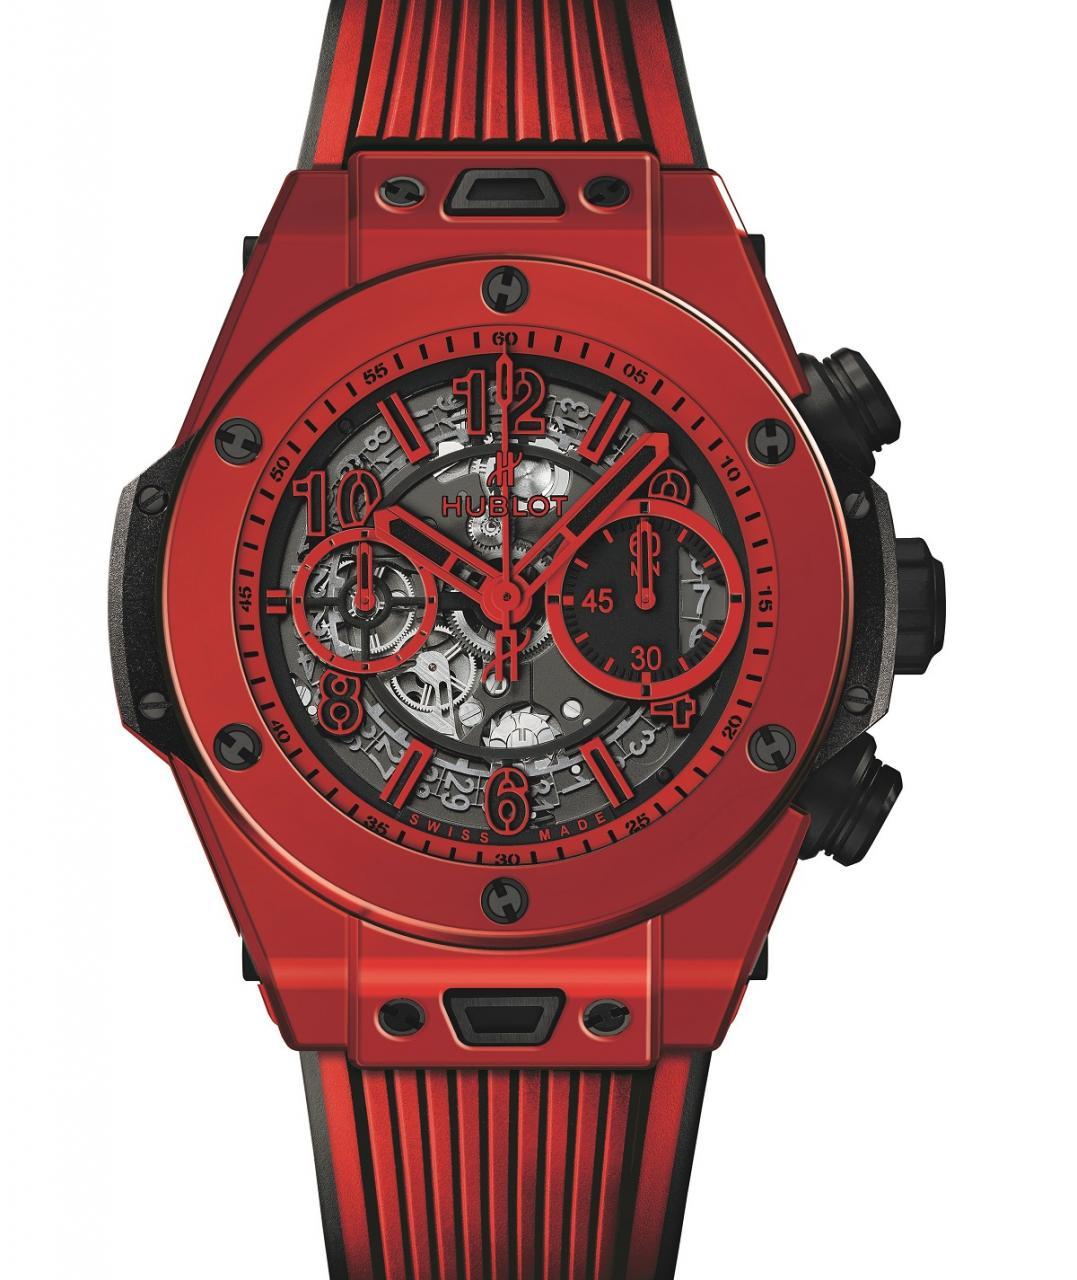 Hublot Big Bang UNICO Red Magic Ceramic Watch Watch Releases